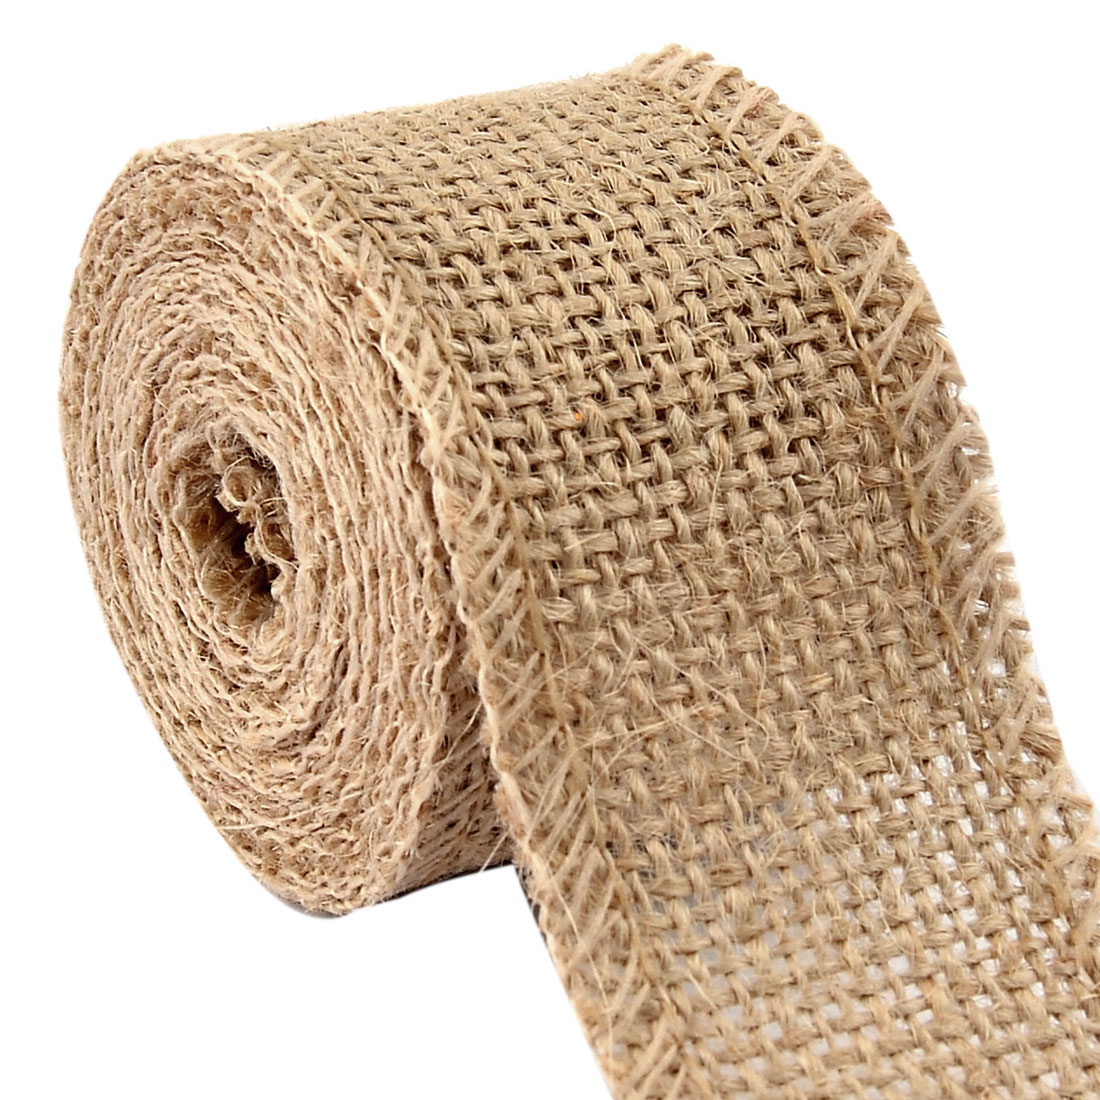 Gift Tags Burlap Belt Strap String Crafting Jute Ribbon Roll Beige 2.2 Yards